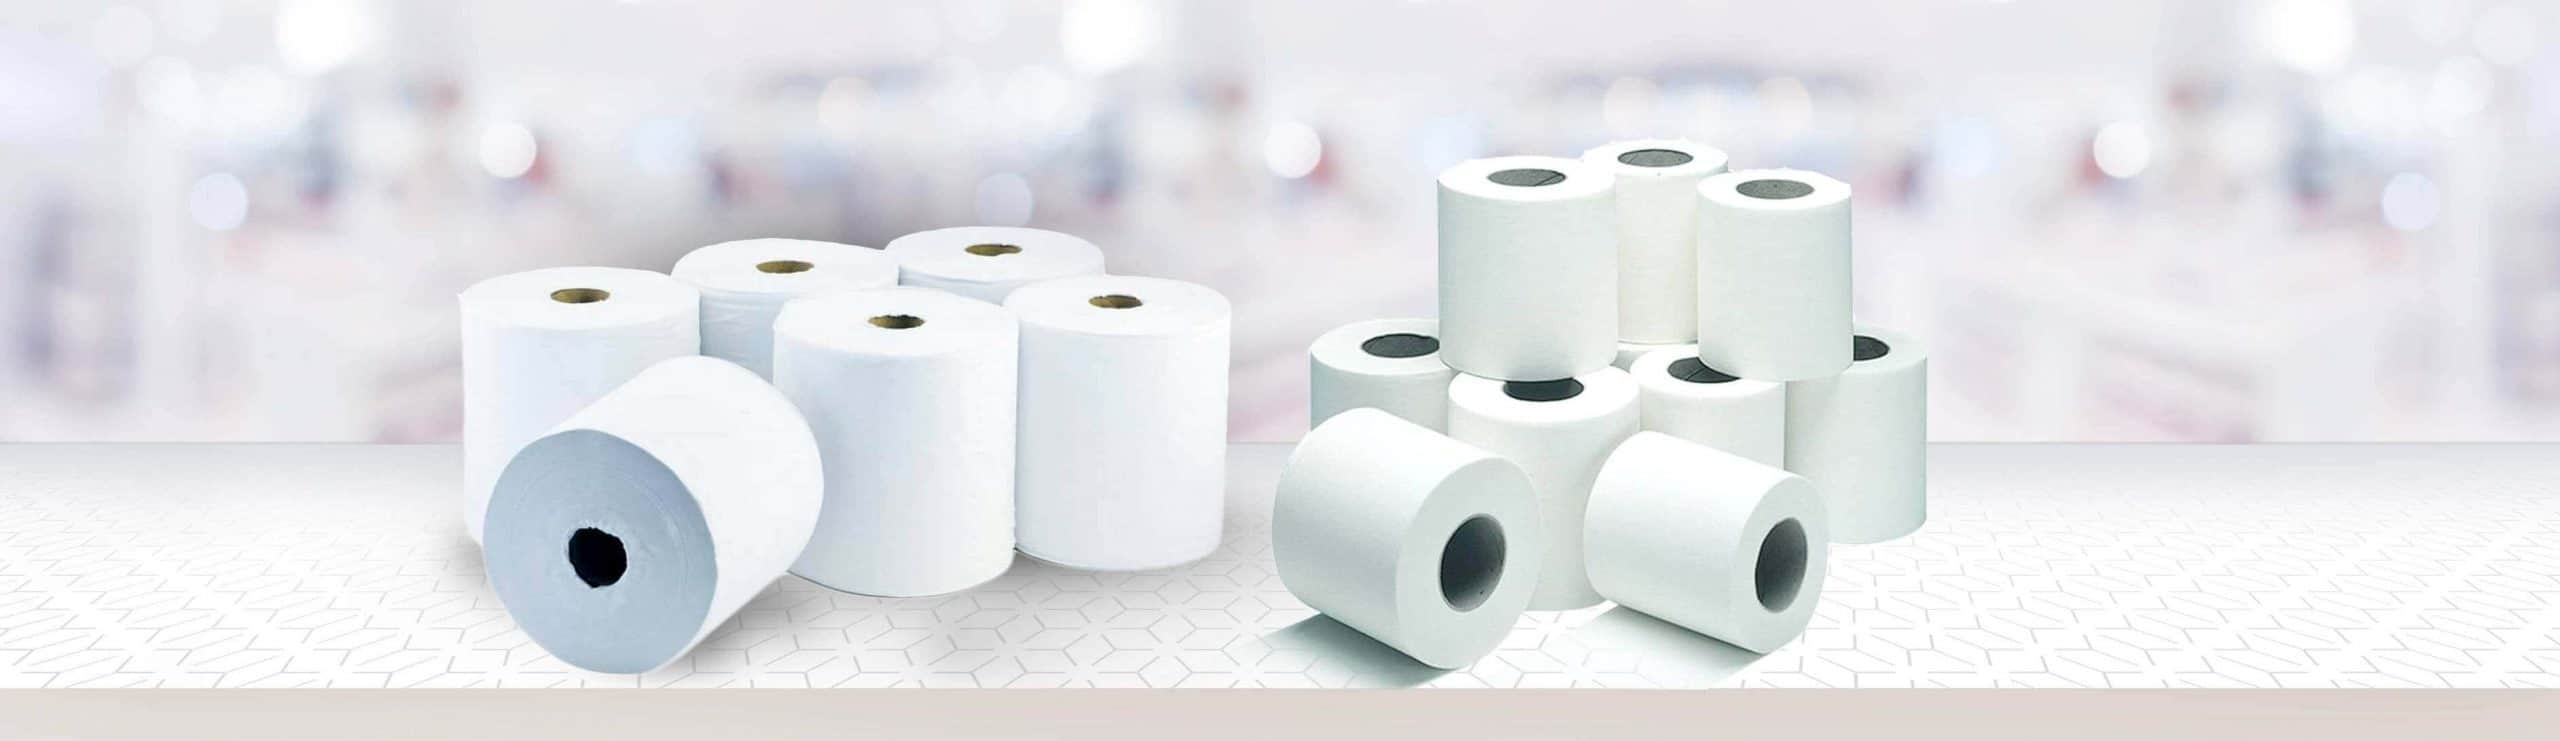 Maxi Tissue Rolls